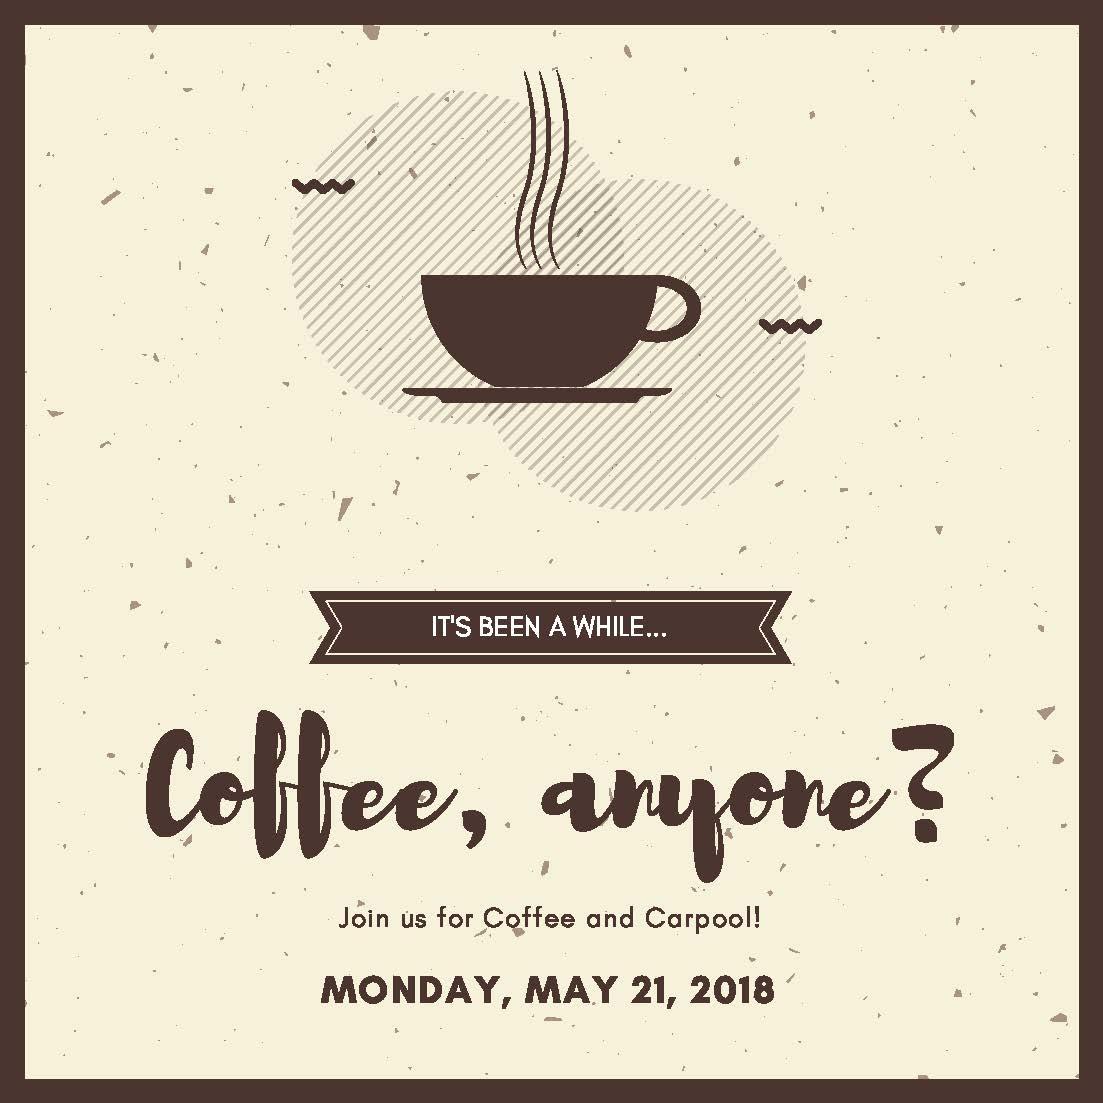 Coffee, anyone_.jpg